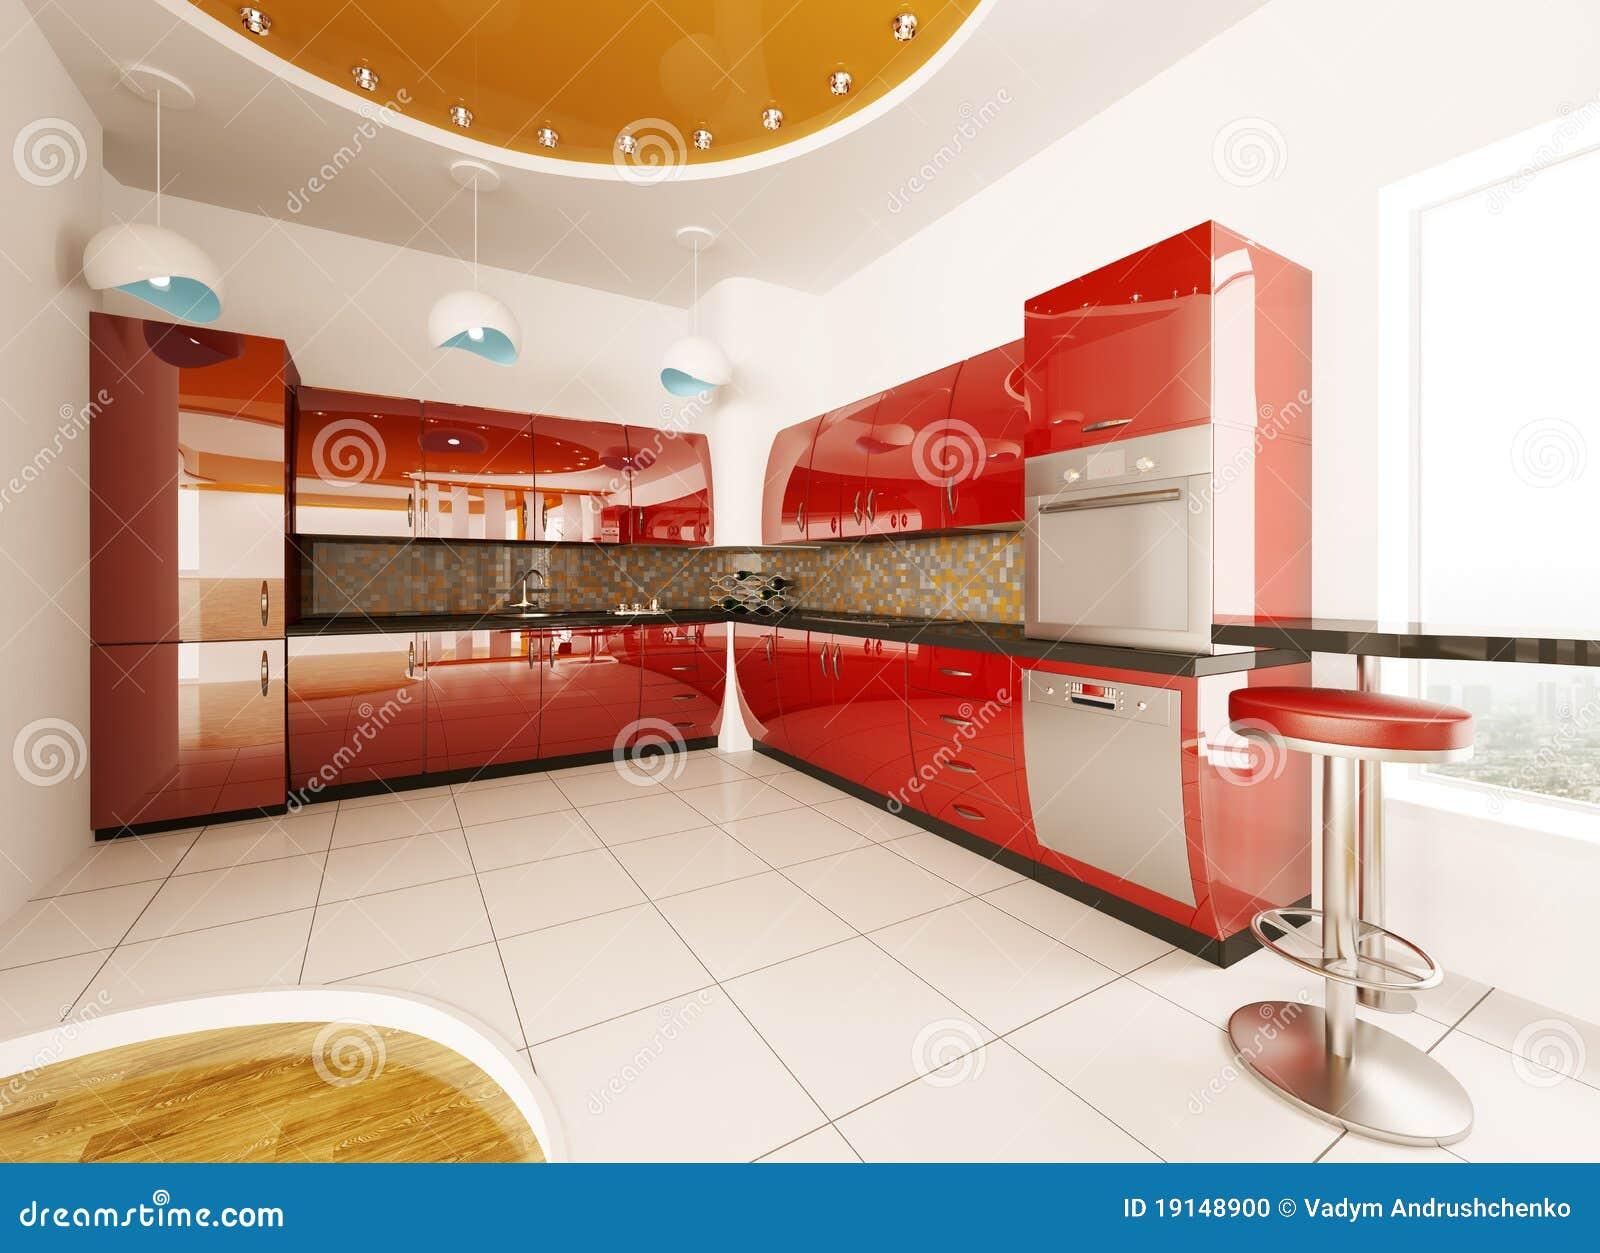 El dise o interior de la cocina moderna 3d rinde stock de - Diseno de cocina 3d ...